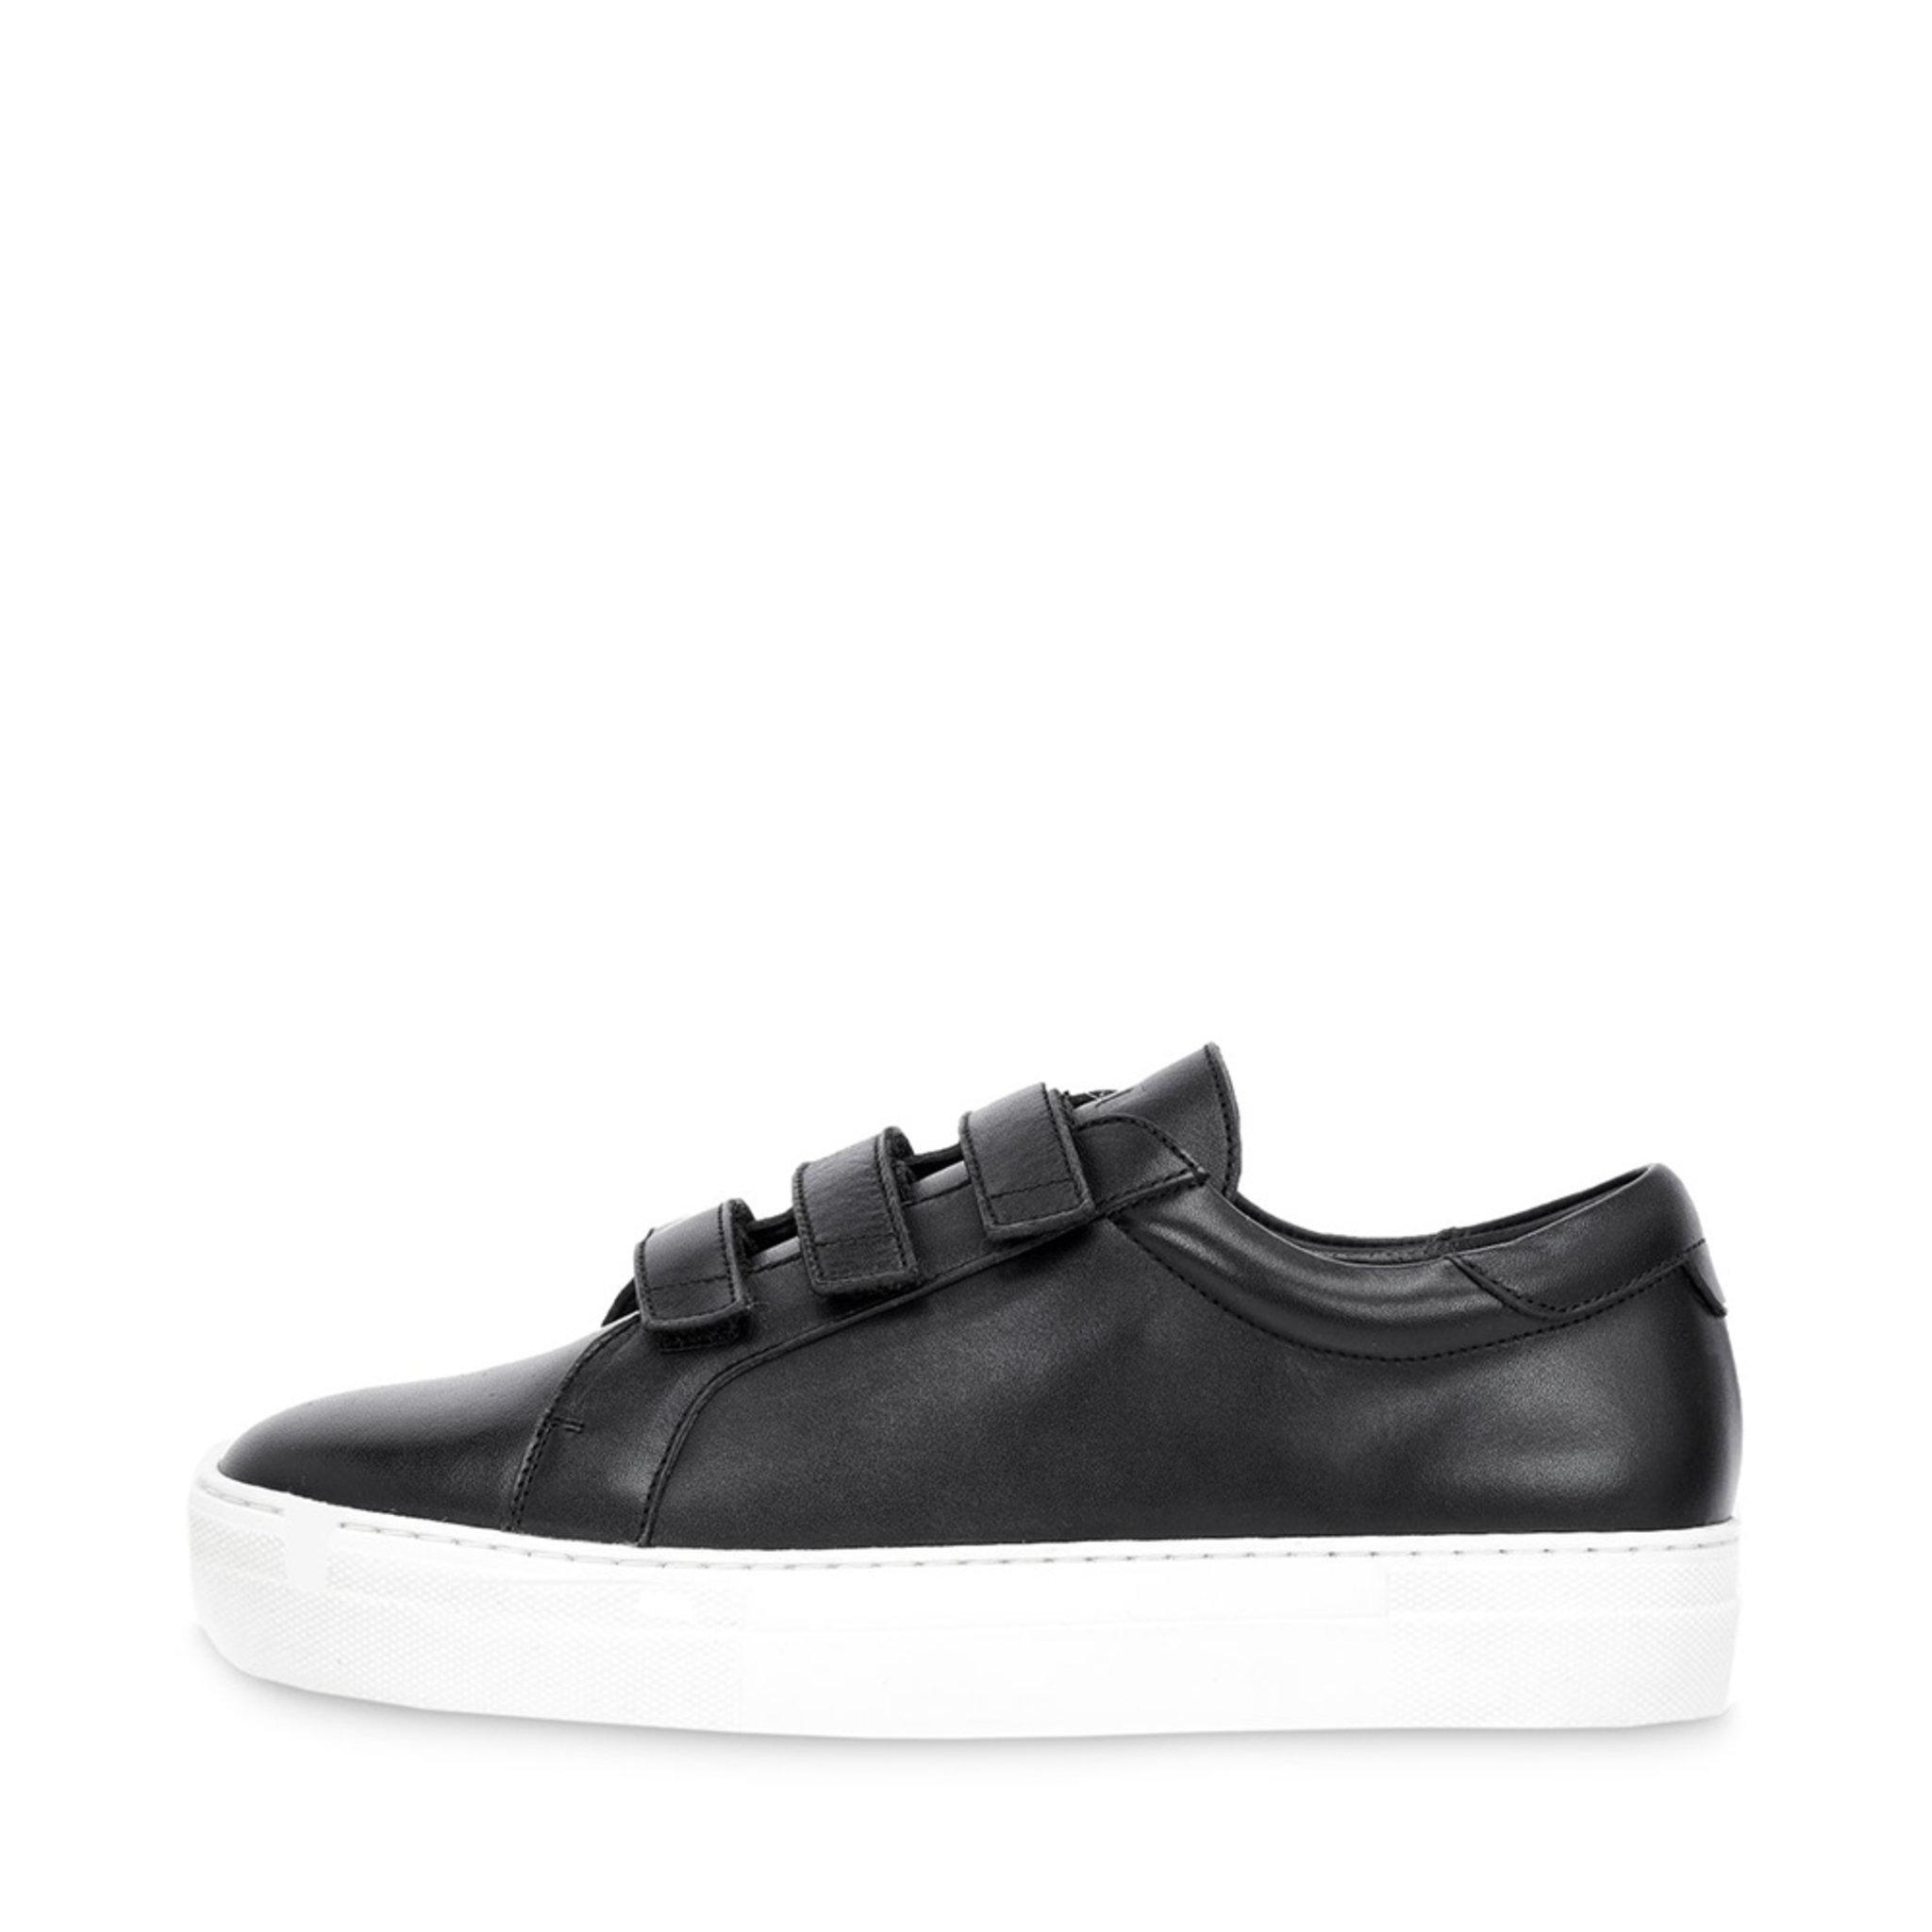 73ebfd16 Velcro Sneaker Solid Leather Sneakers - Sneakers - Köp online på åhlens.se!